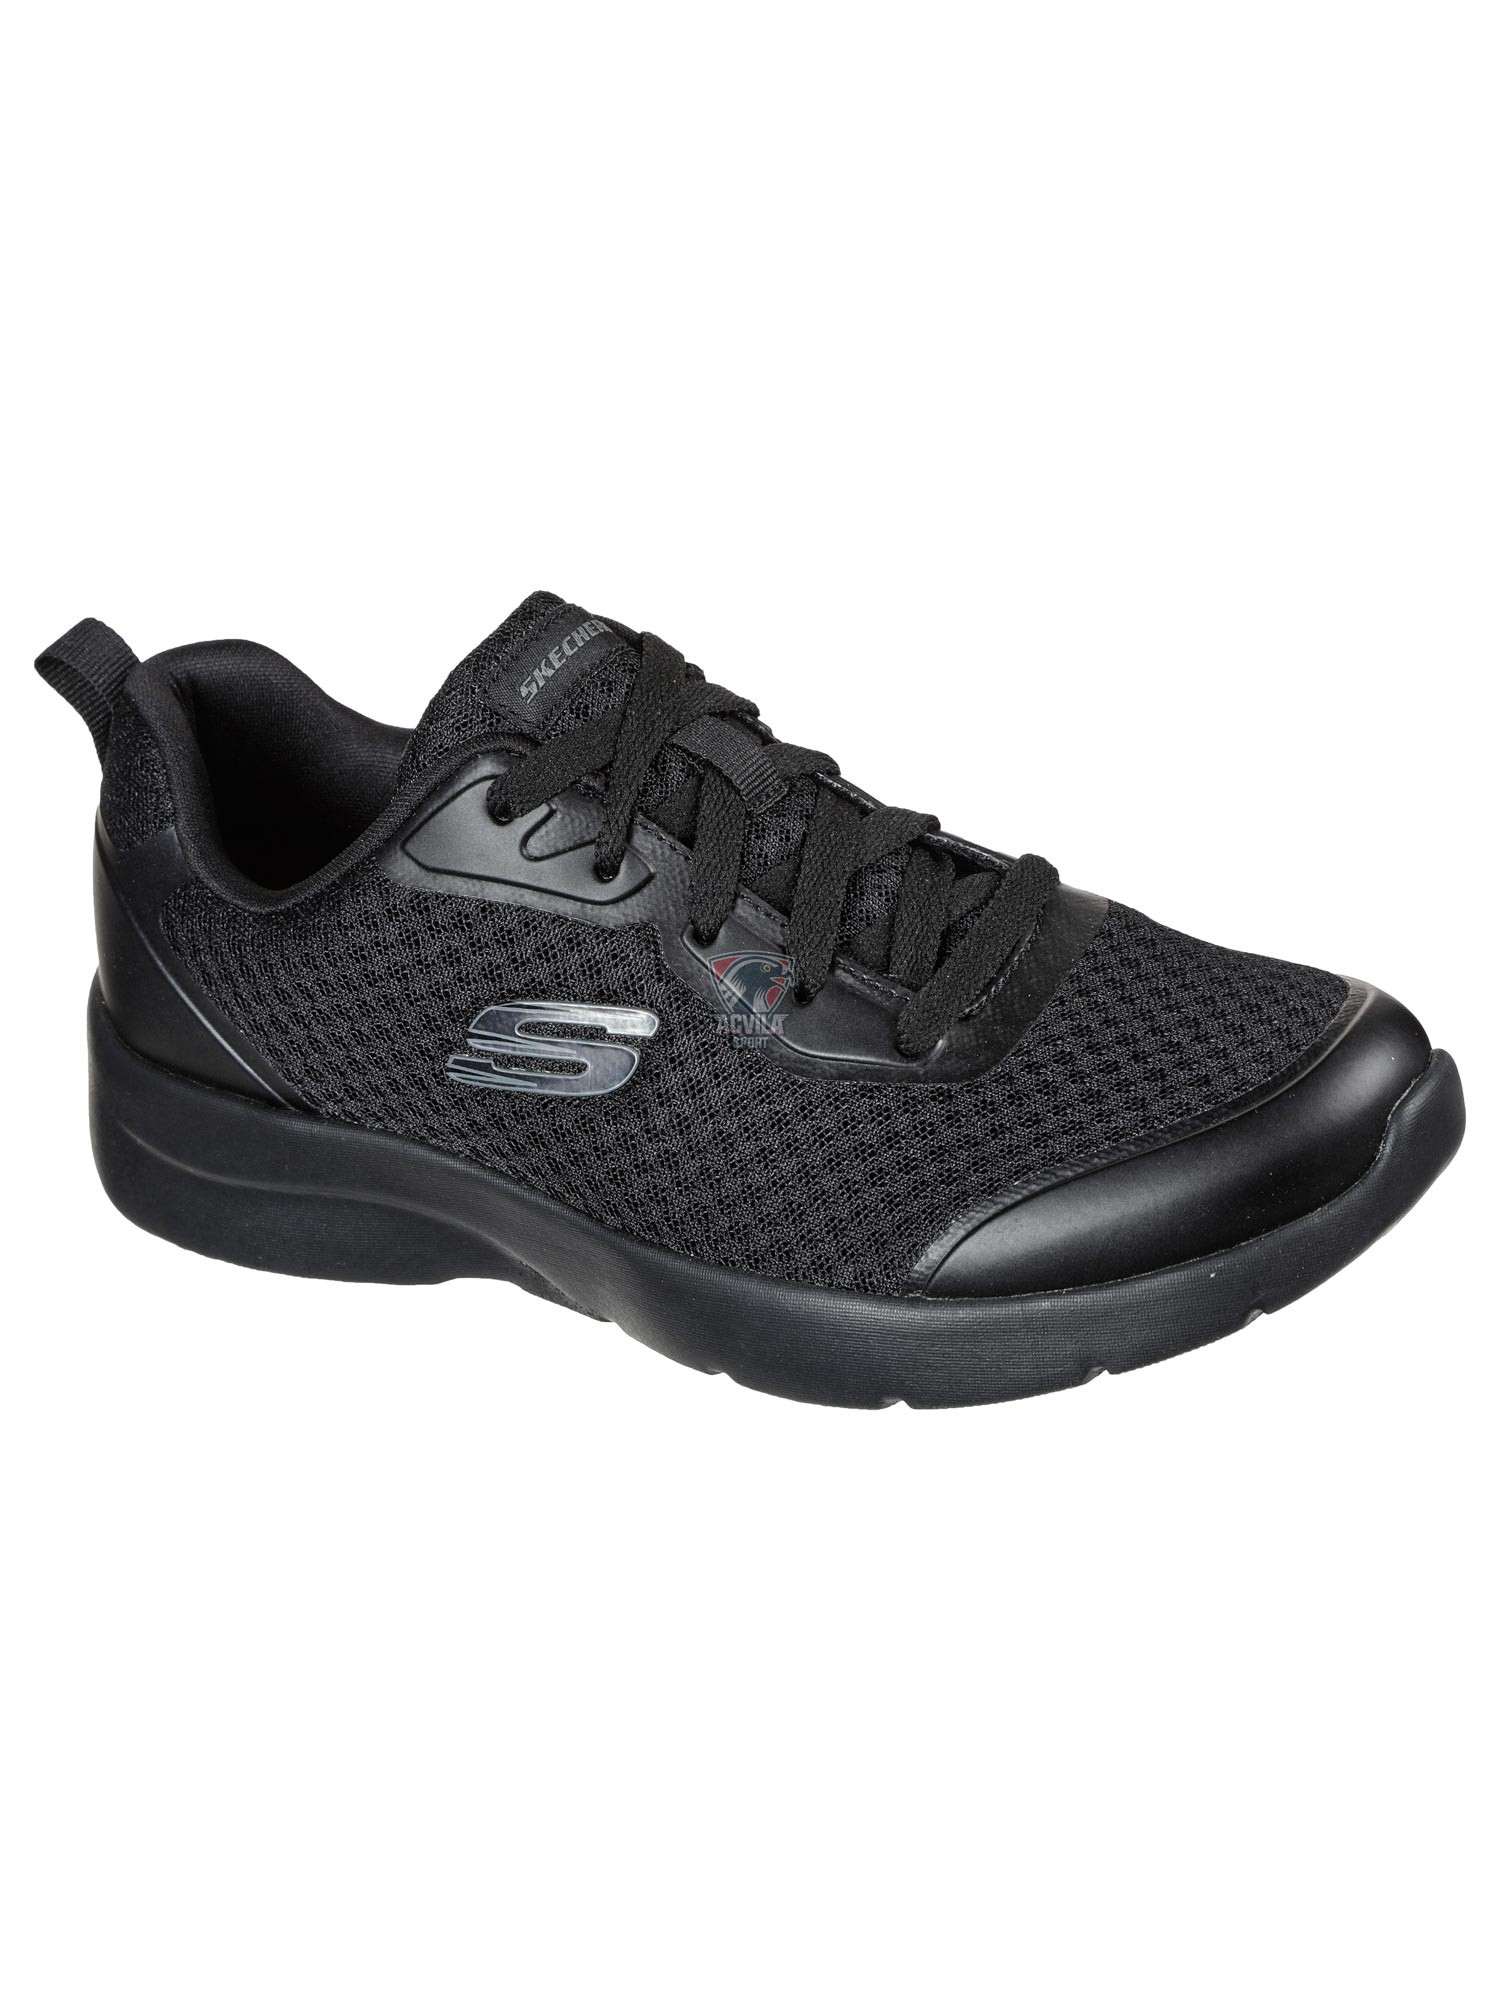 photo 4 Спортивная обувь SKECHERS DIMANIGHT 2.0